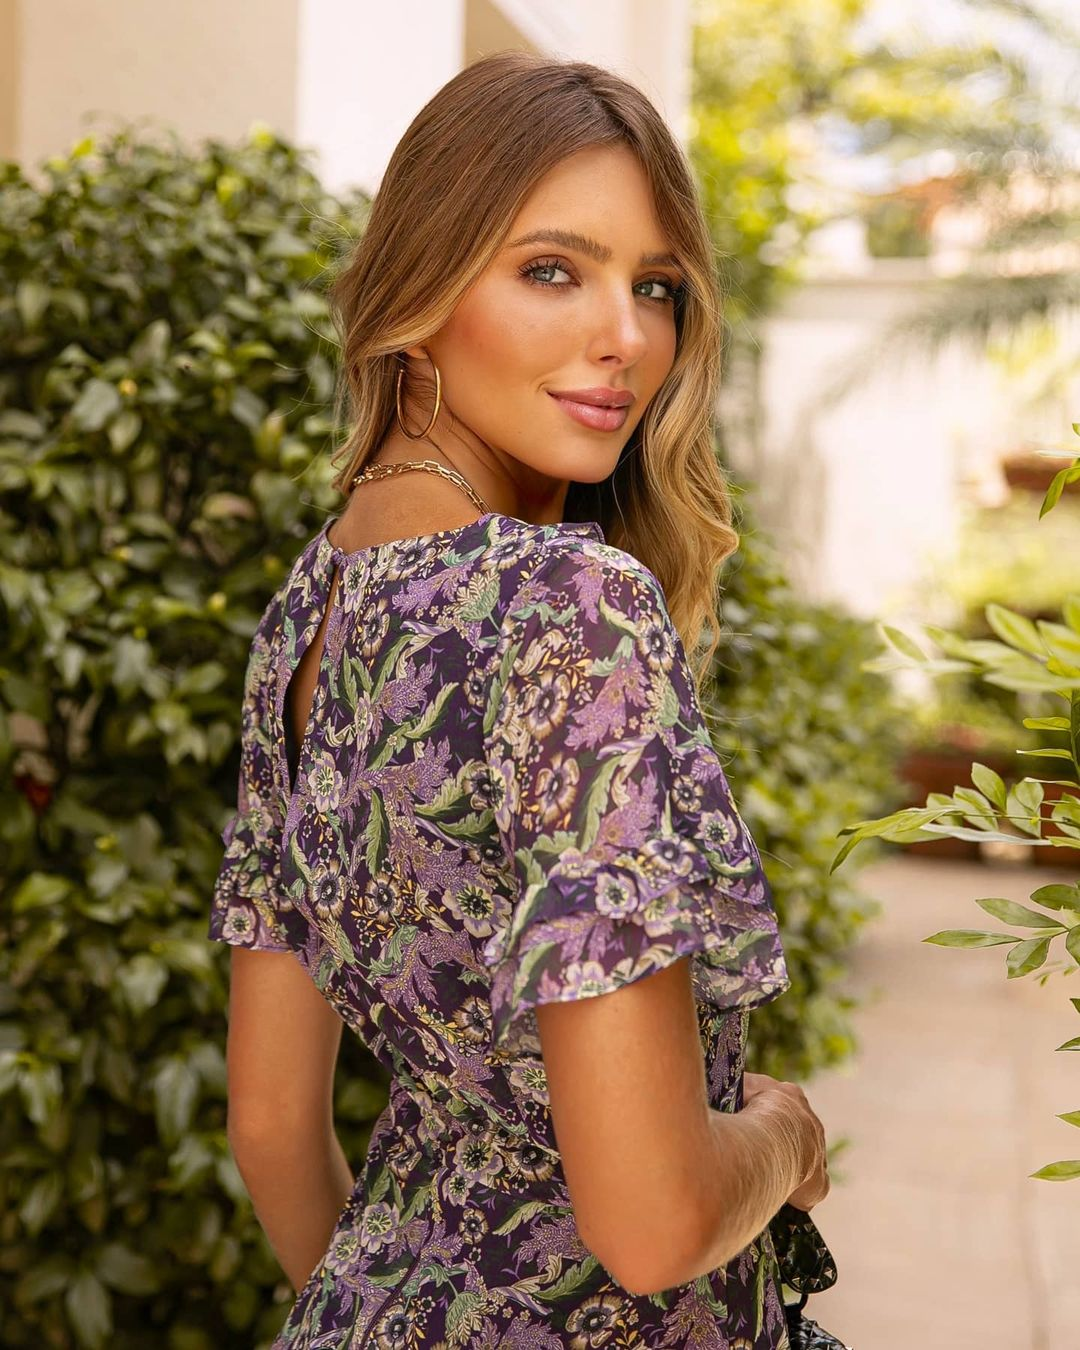 Vestido floral com jabots